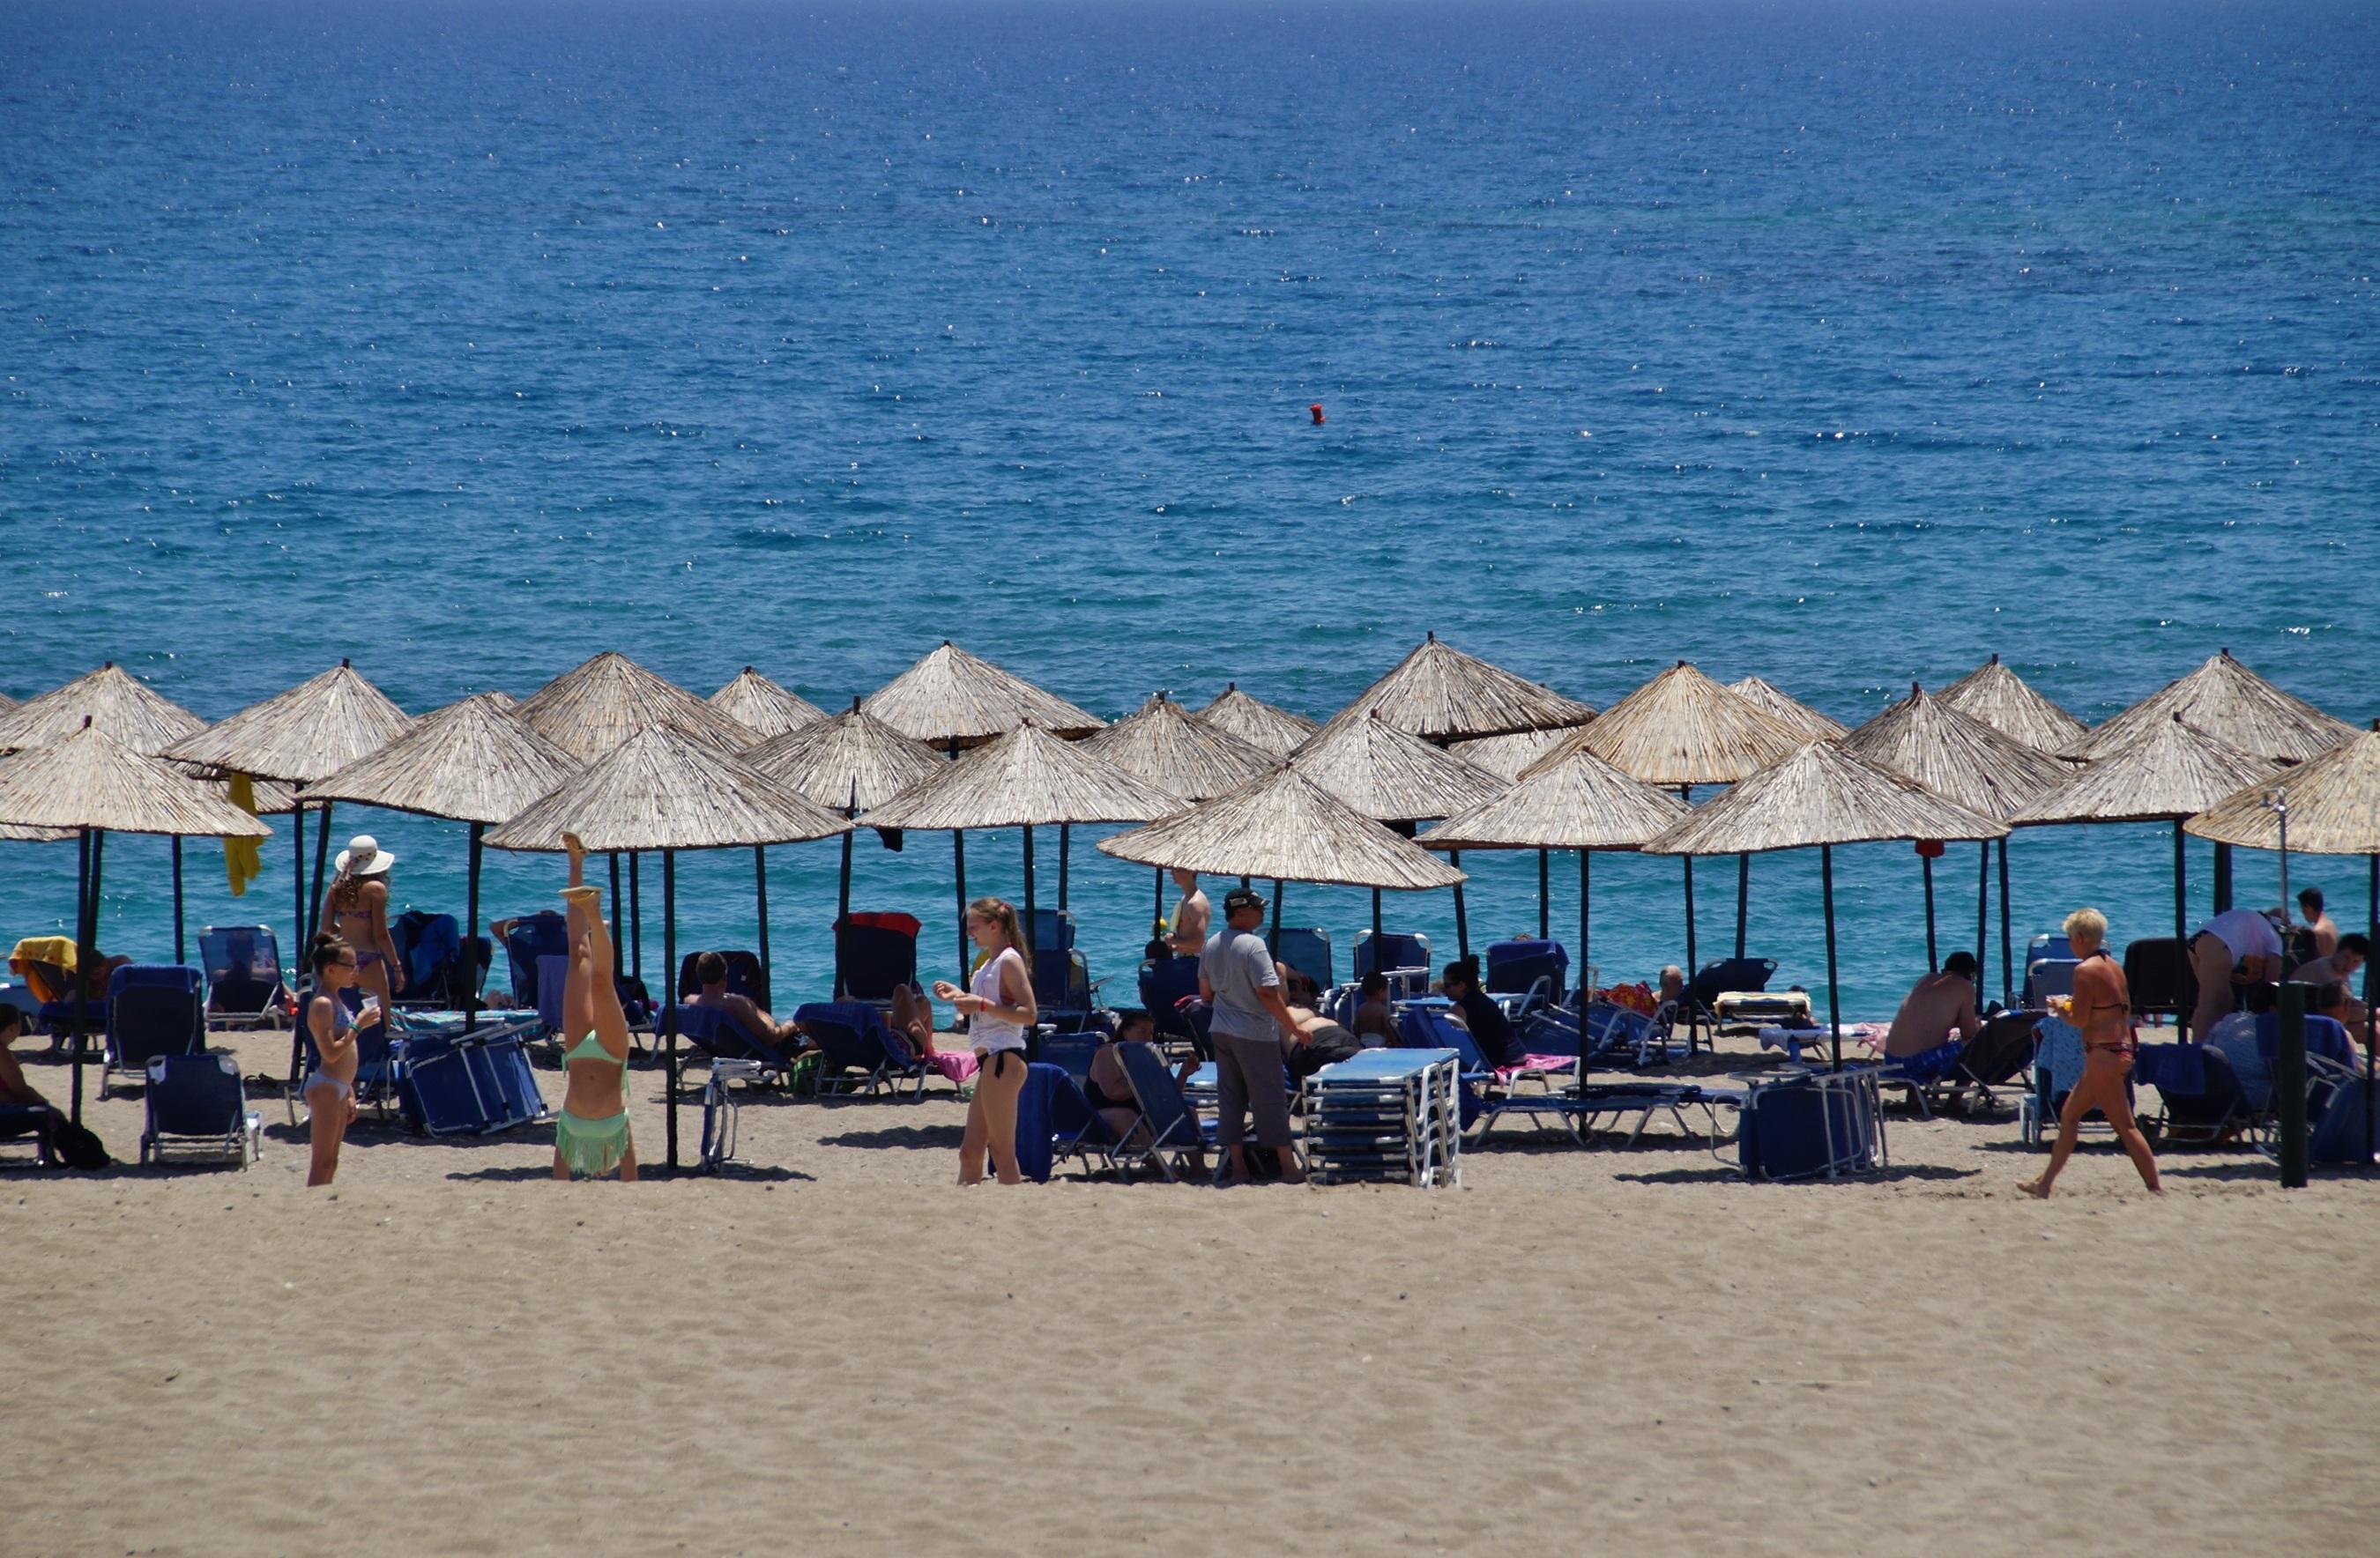 Suggestive beach scene stock photo. Image of summer